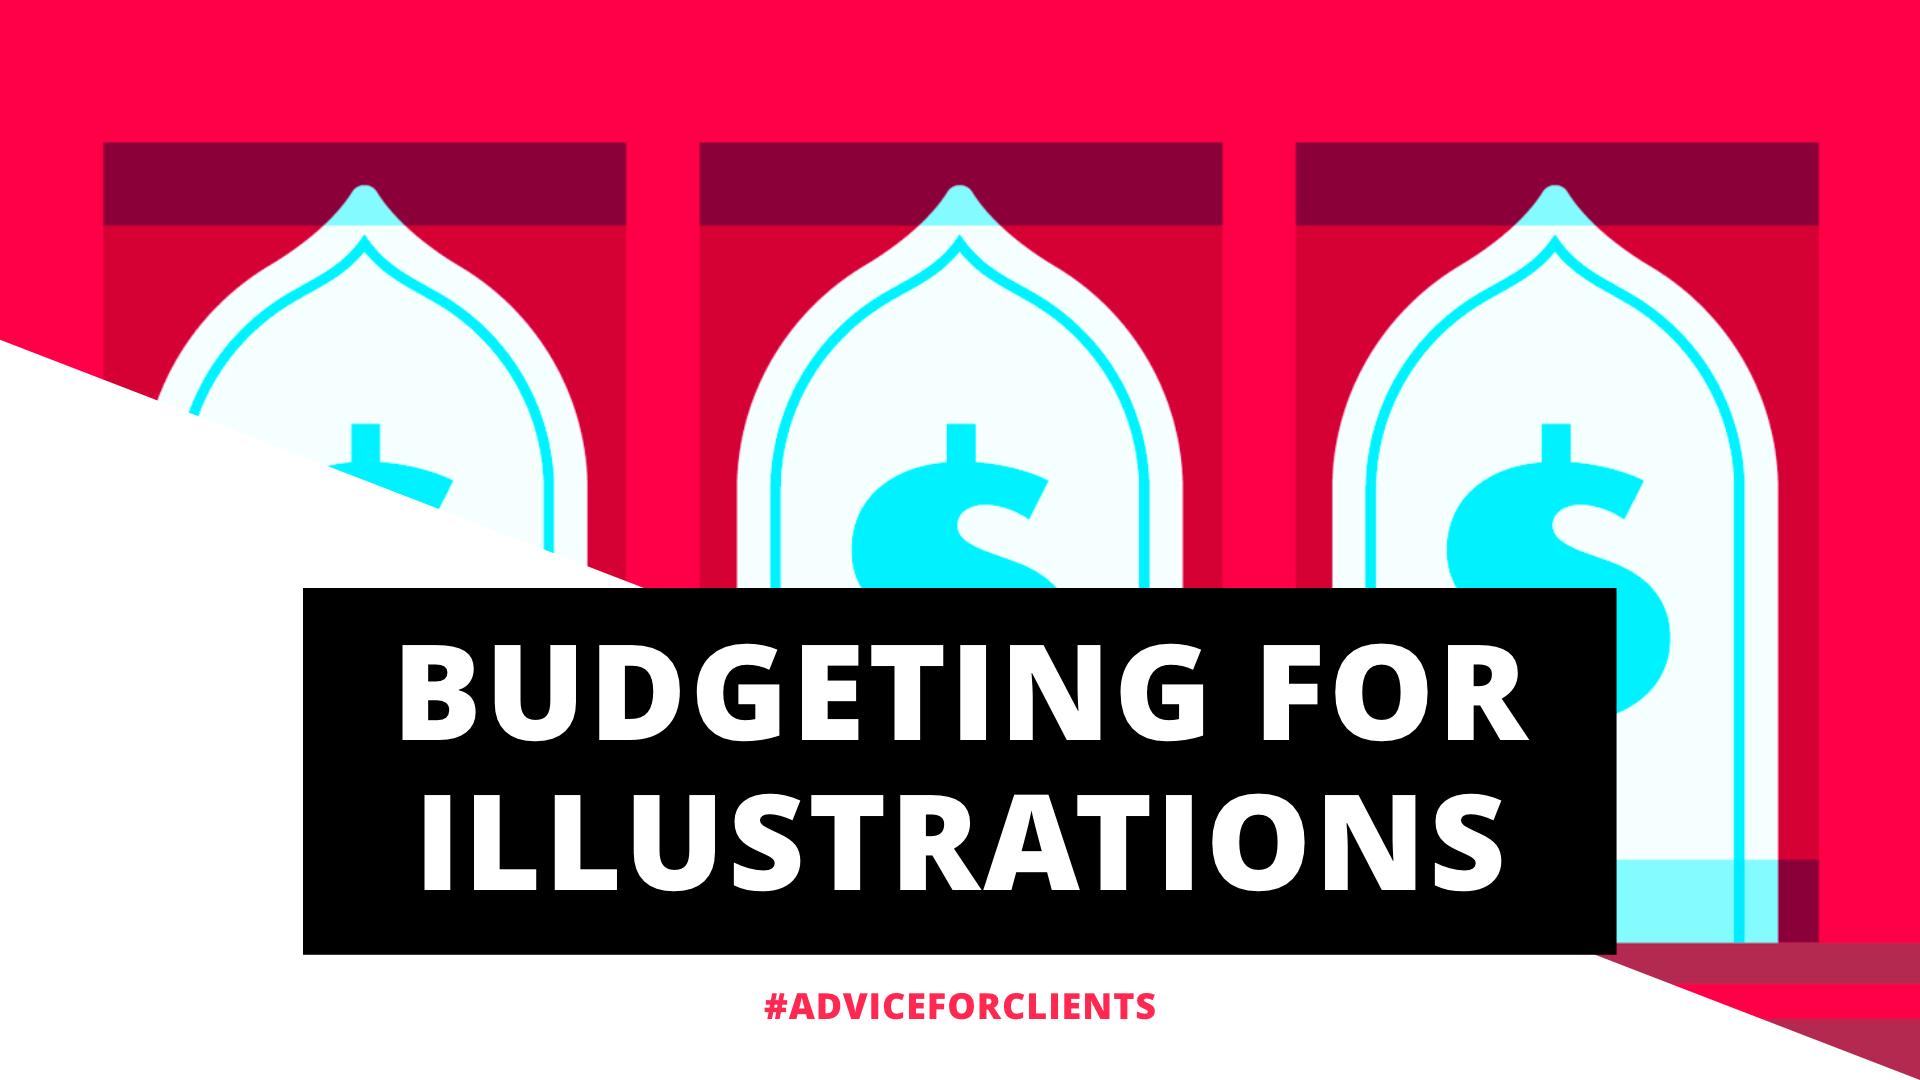 RockyRoark_Header_Budgeting-For-Illustration.png